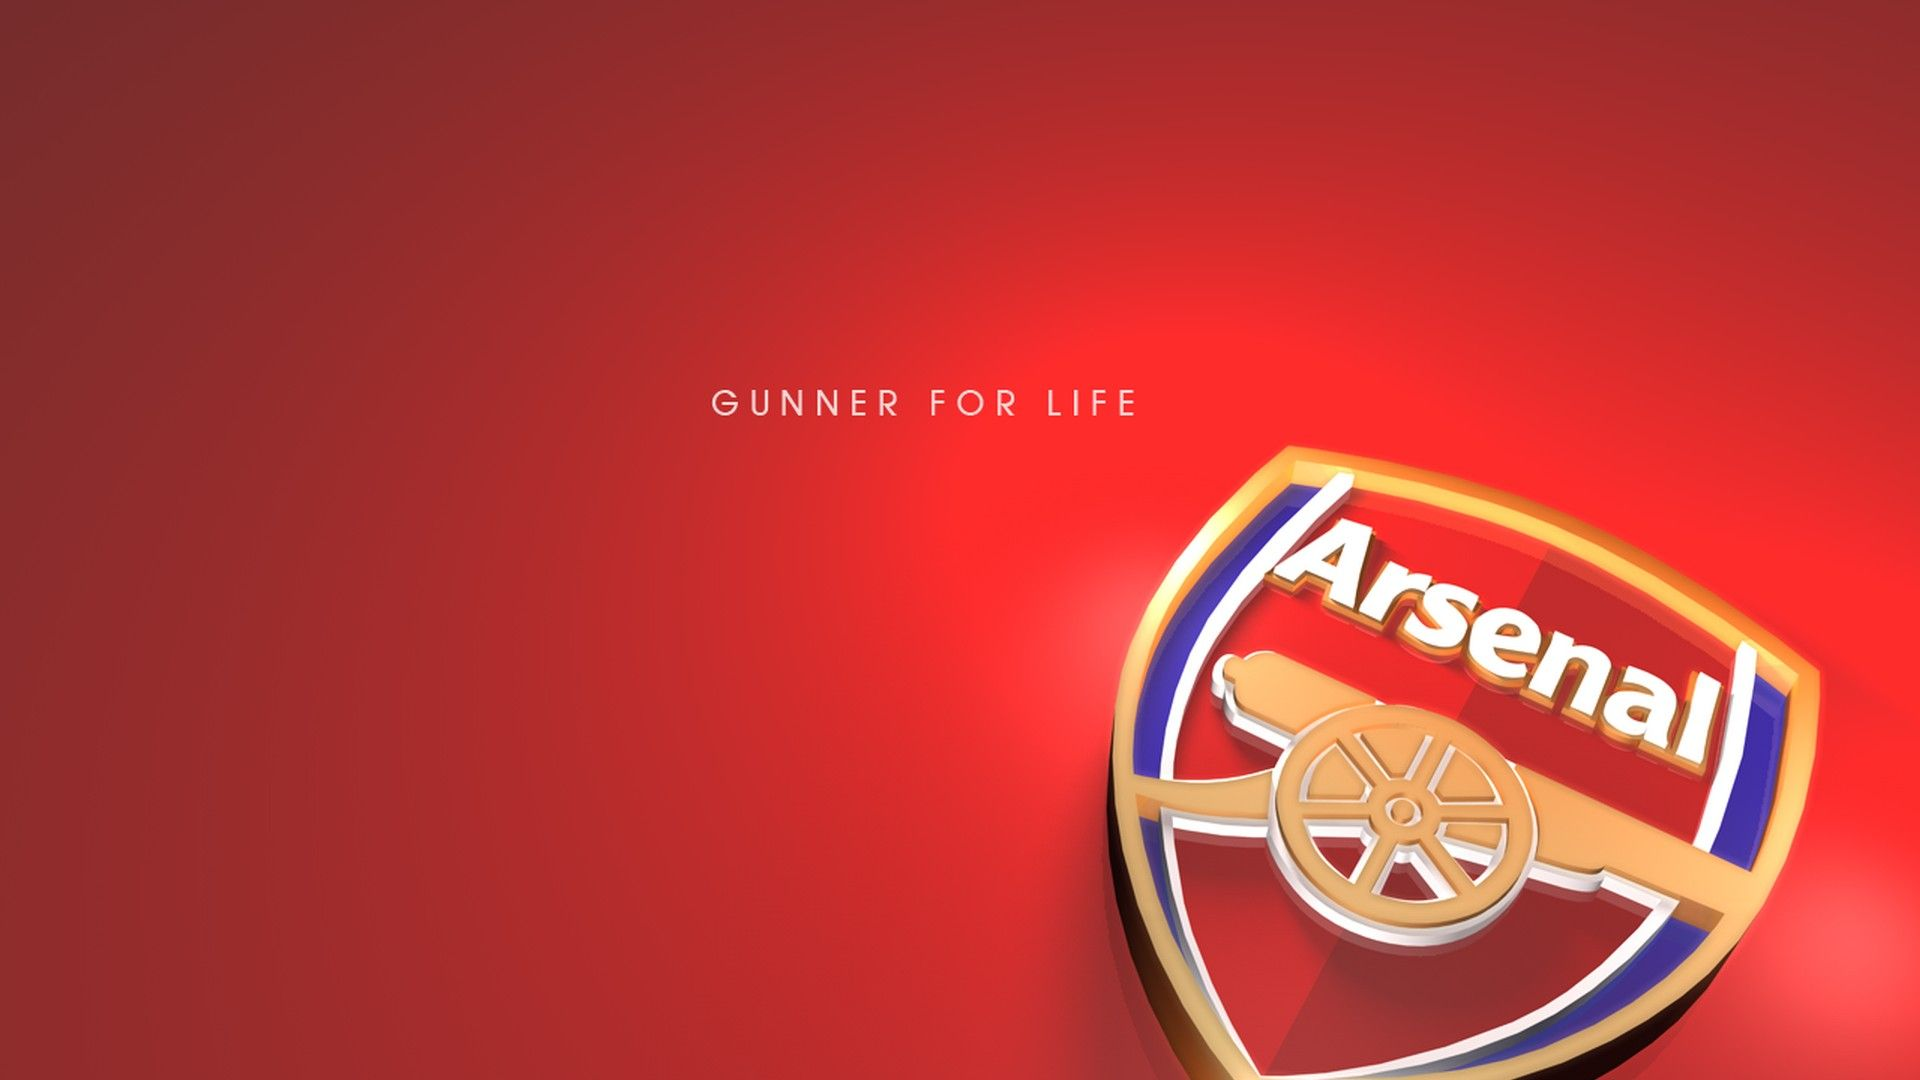 Arsenal Wallpaper For Mac Best Football Wallpaper Hd Arsenal Wallpapers Football Wallpaper Arsenal